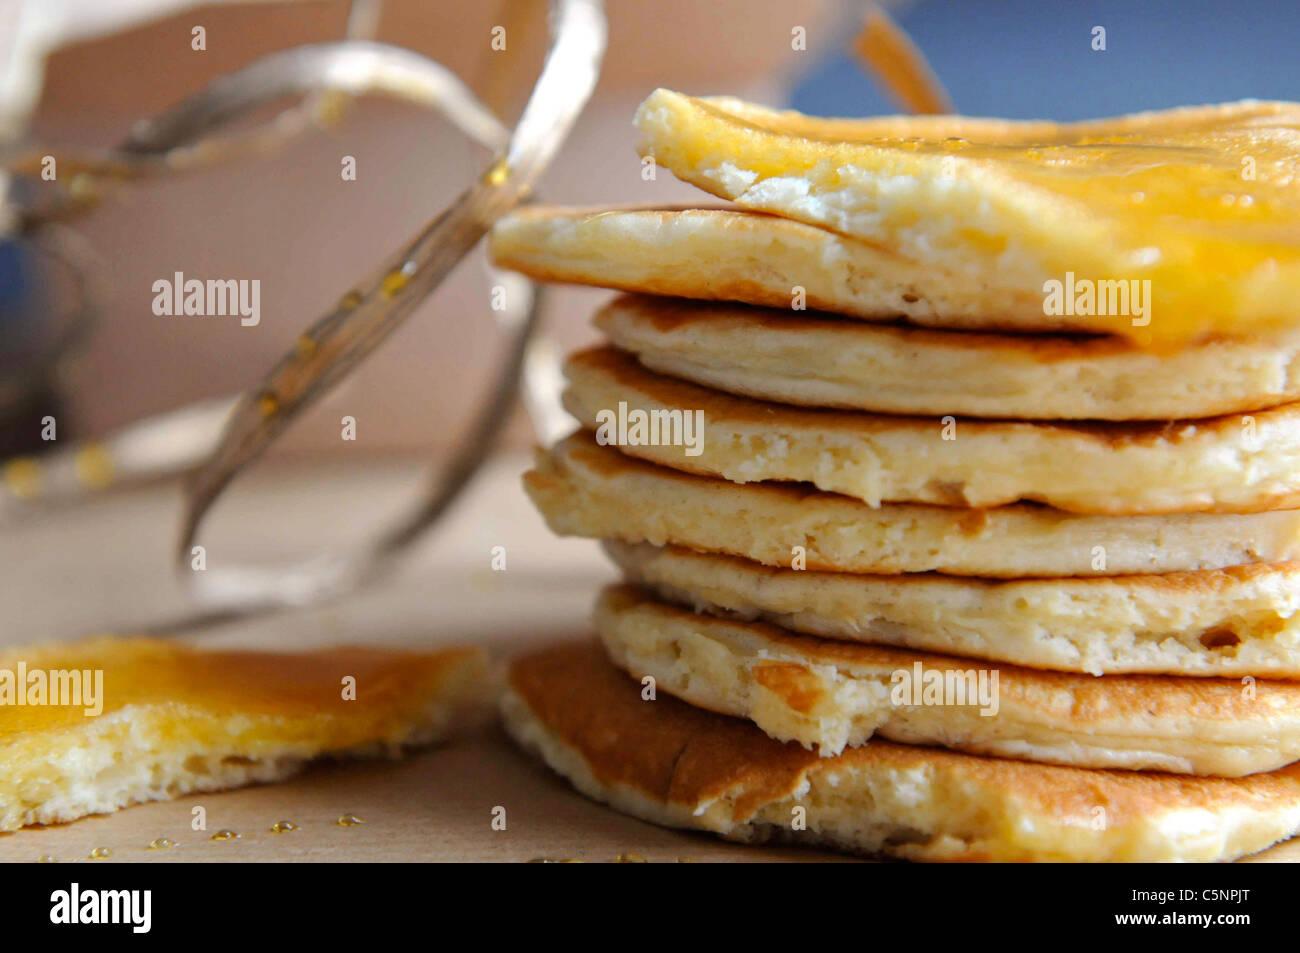 Pancakes con sirope de marple Imagen De Stock